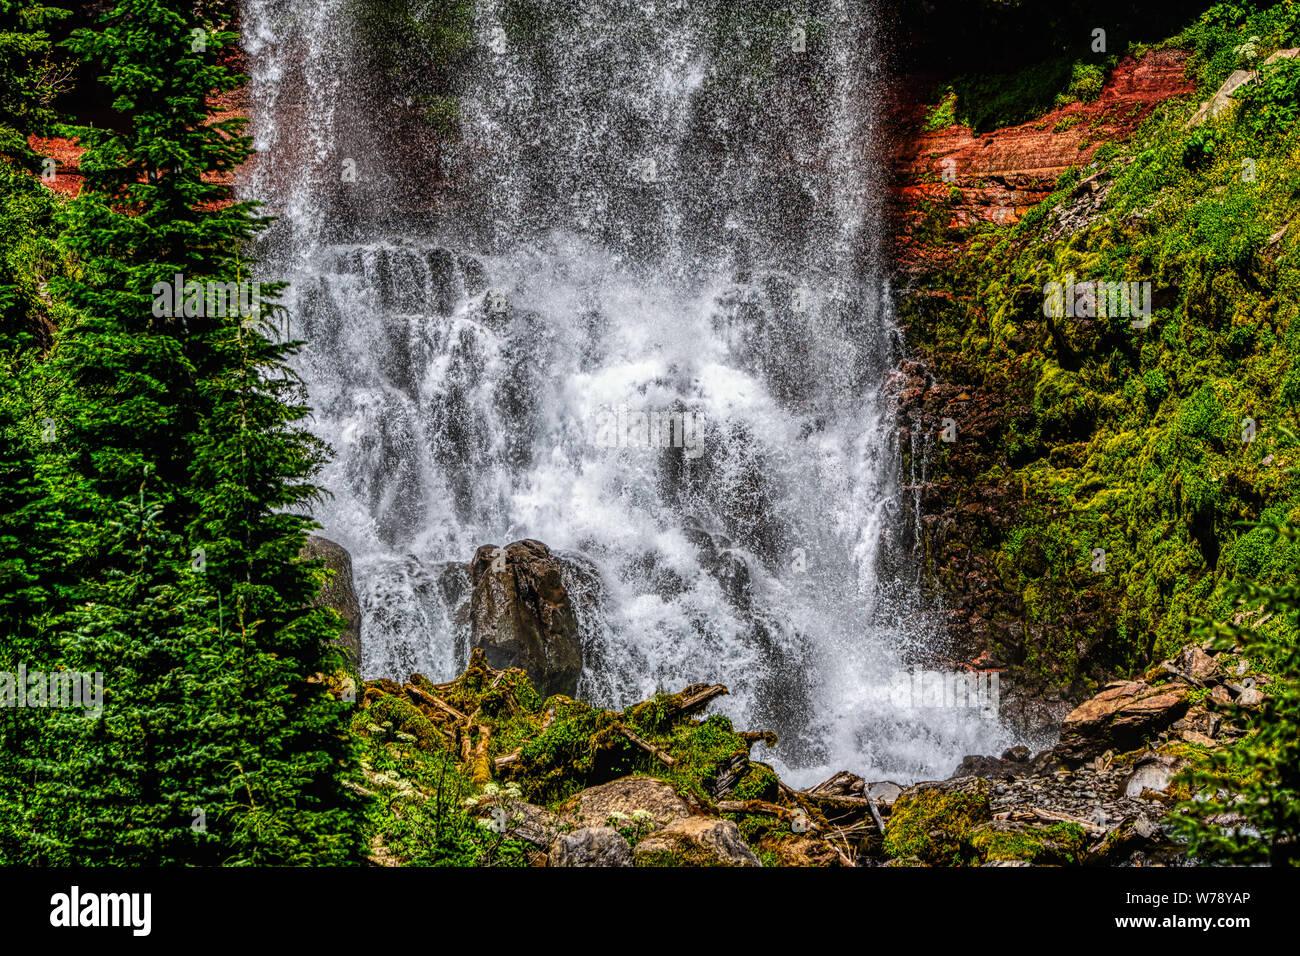 The Beautiful Tumalo Waterfall In High Definition Resolution Stock Photo Alamy